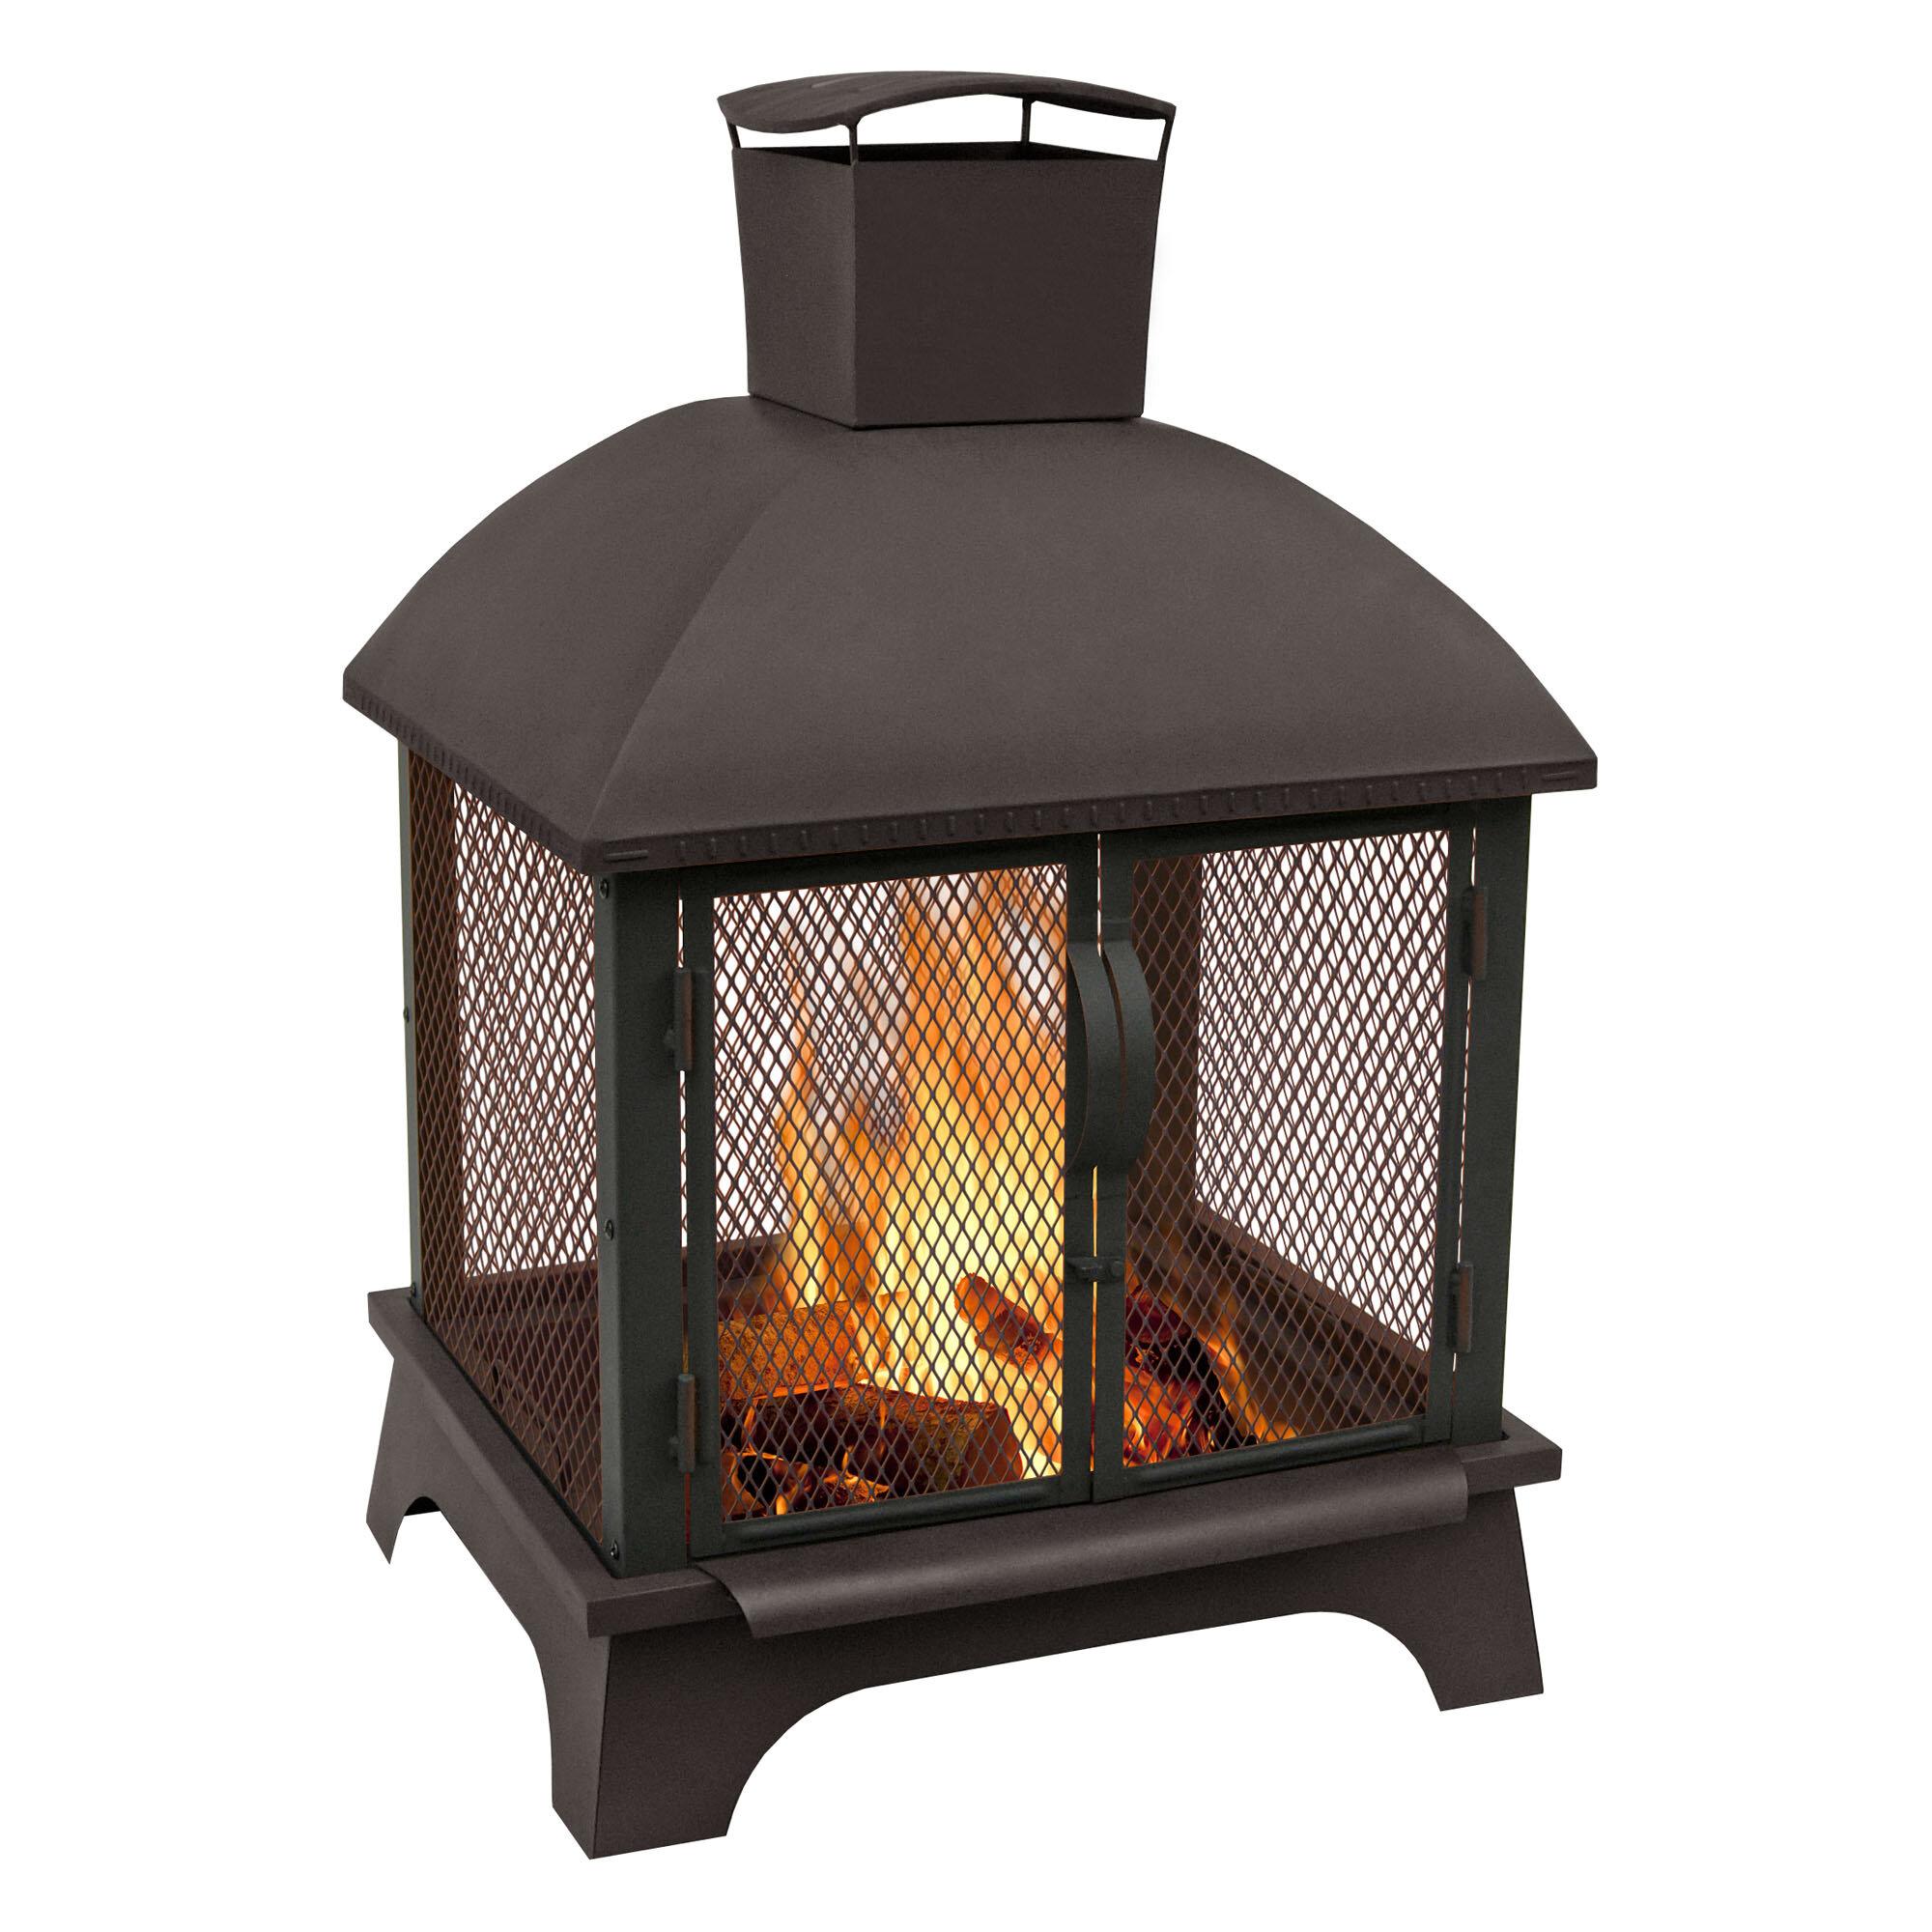 Landmann Steel Wood Burning Outdoor Fireplace Reviews Wayfair